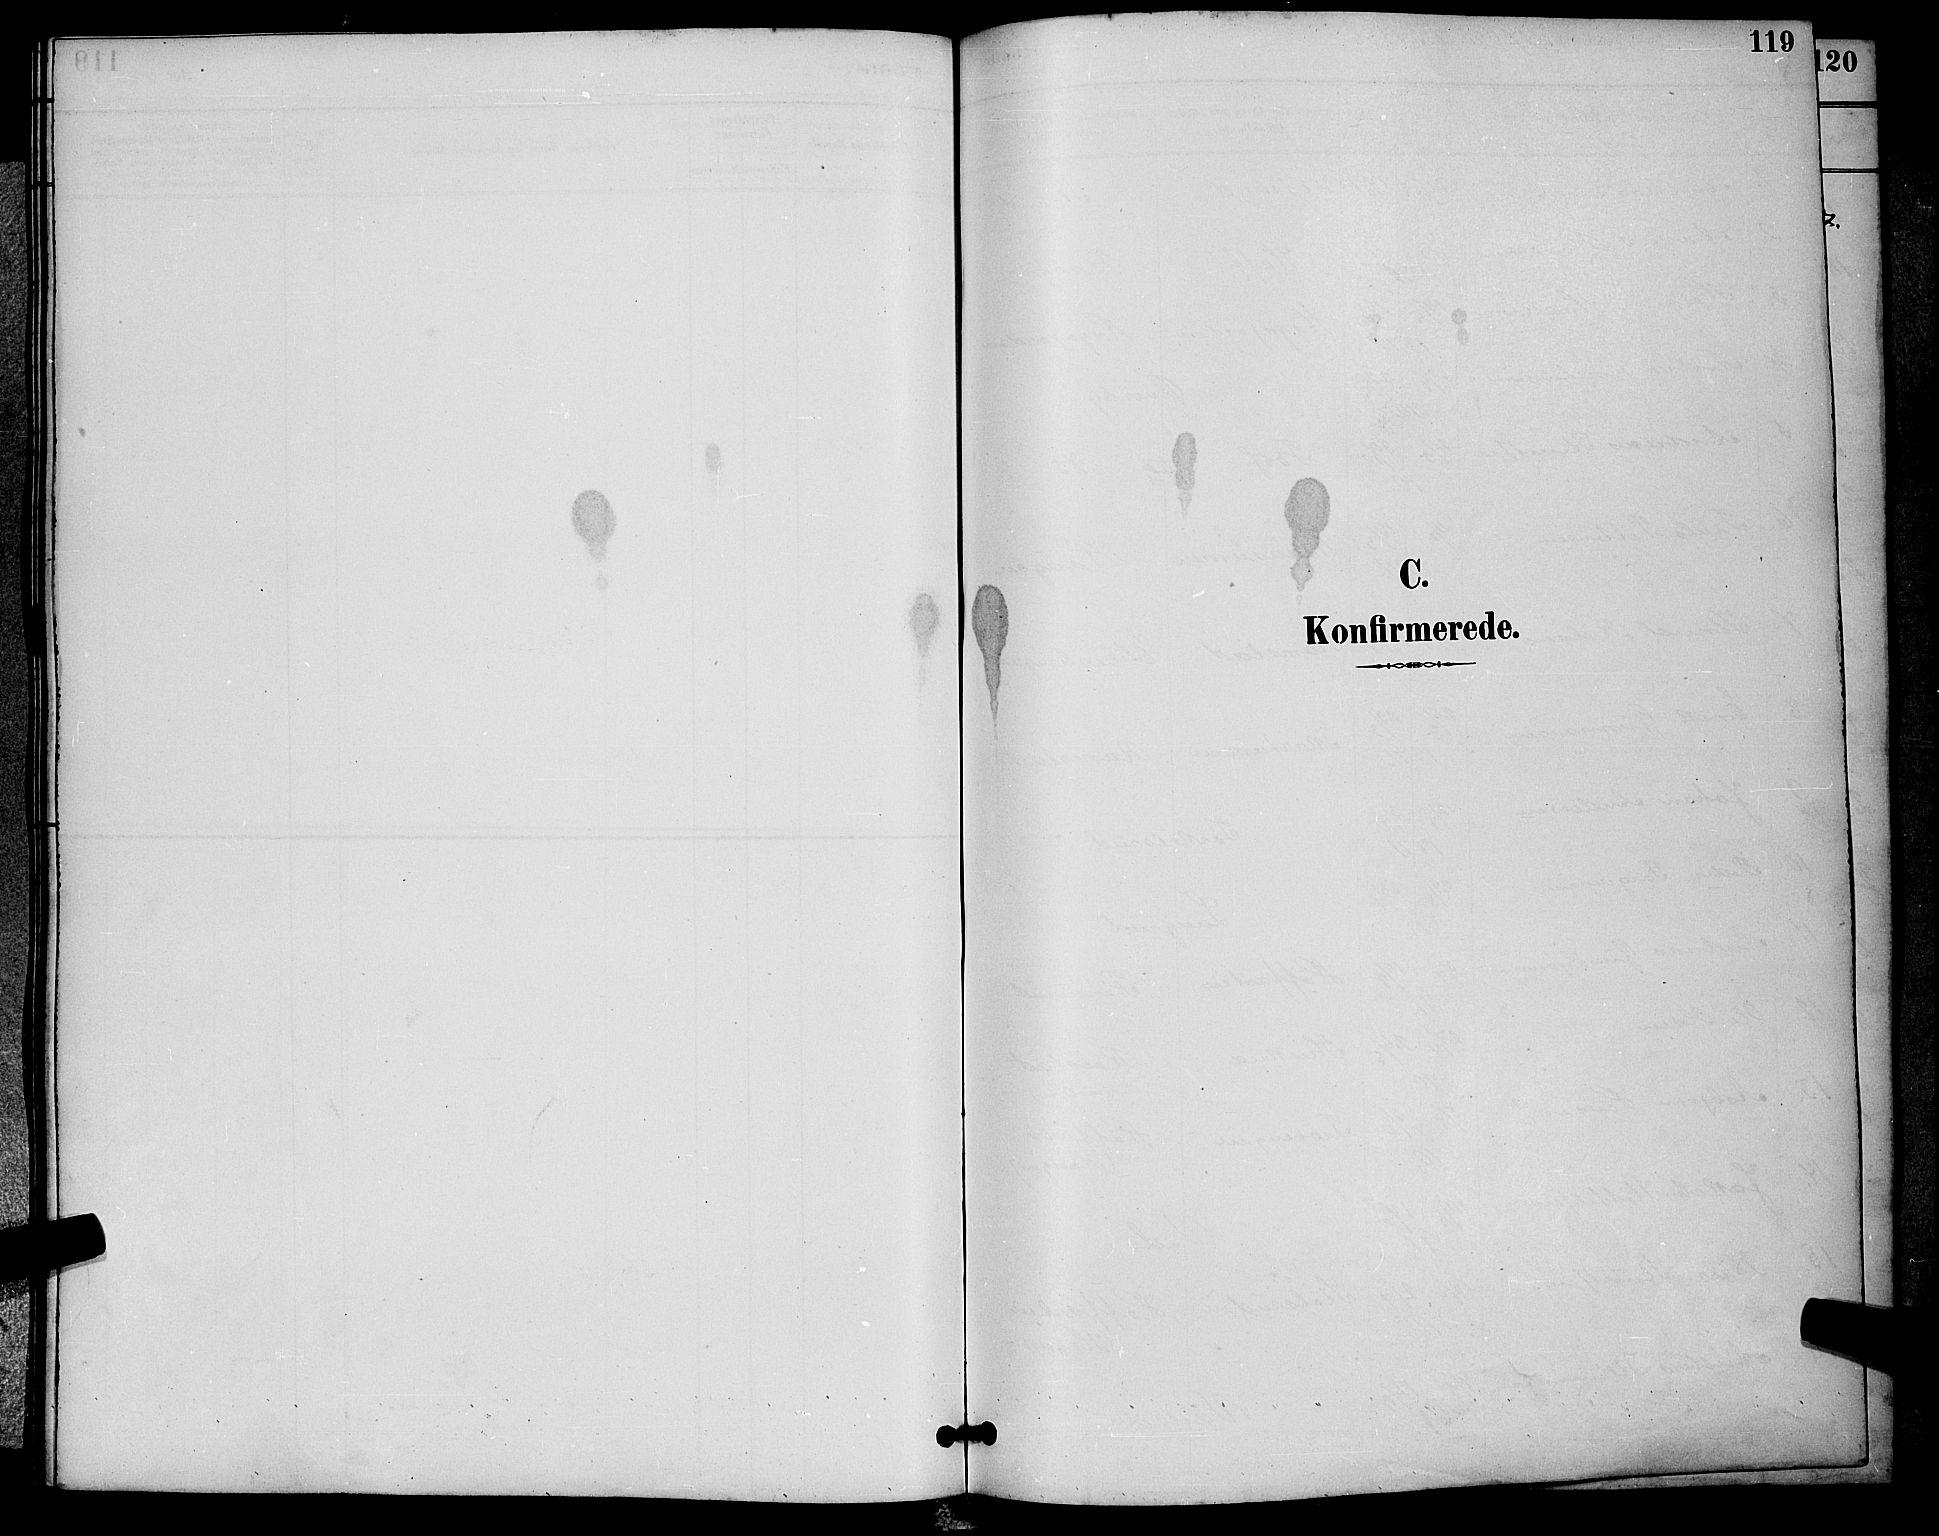 SAKO, Sigdal kirkebøker, G/Ga/L0005: Parish register (copy) no. I 5, 1886-1900, p. 119